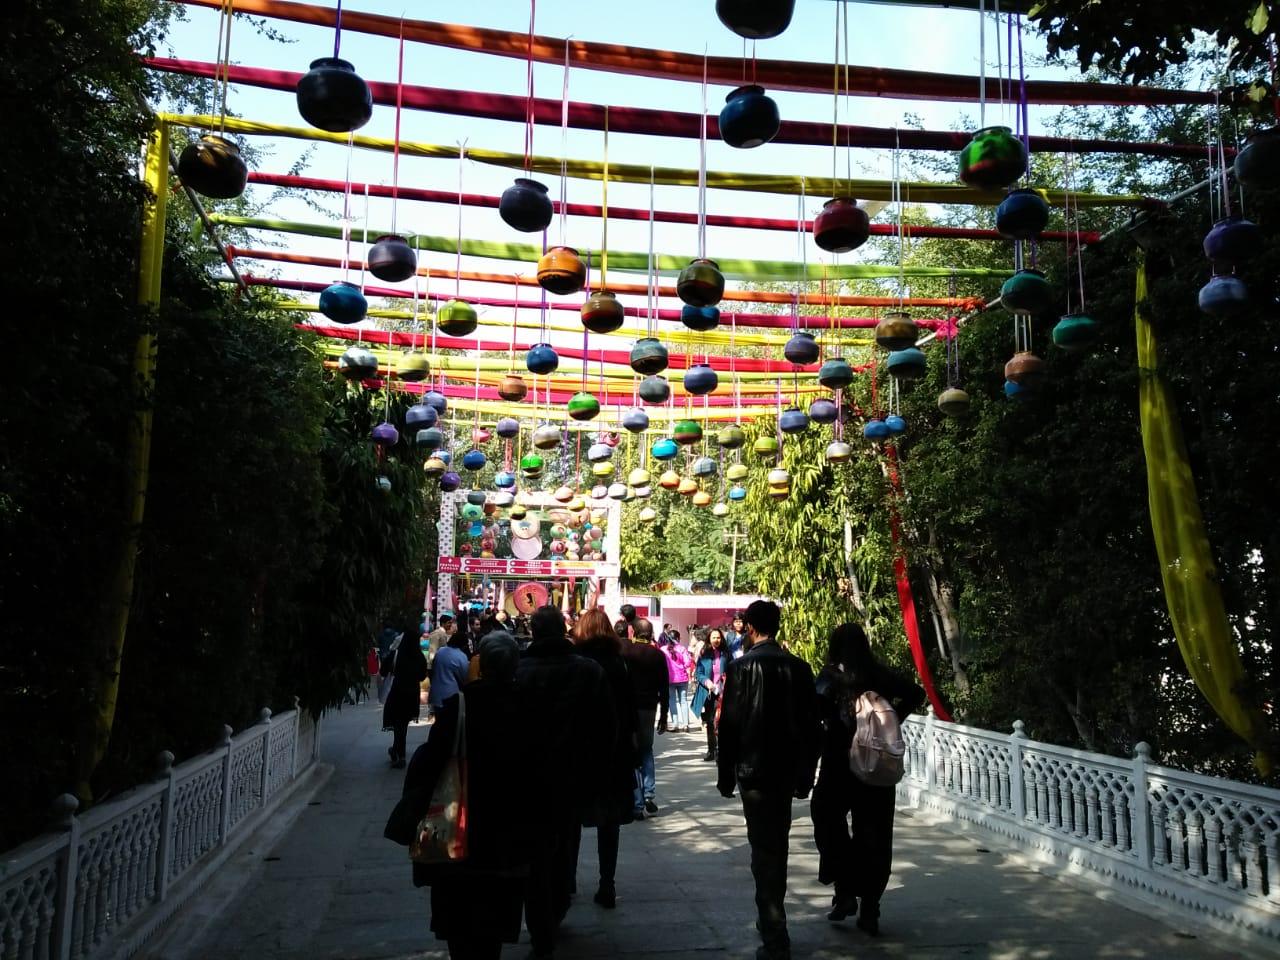 Best Festival Of Rajasthan-Jaipur Literature Festival, Jaipur